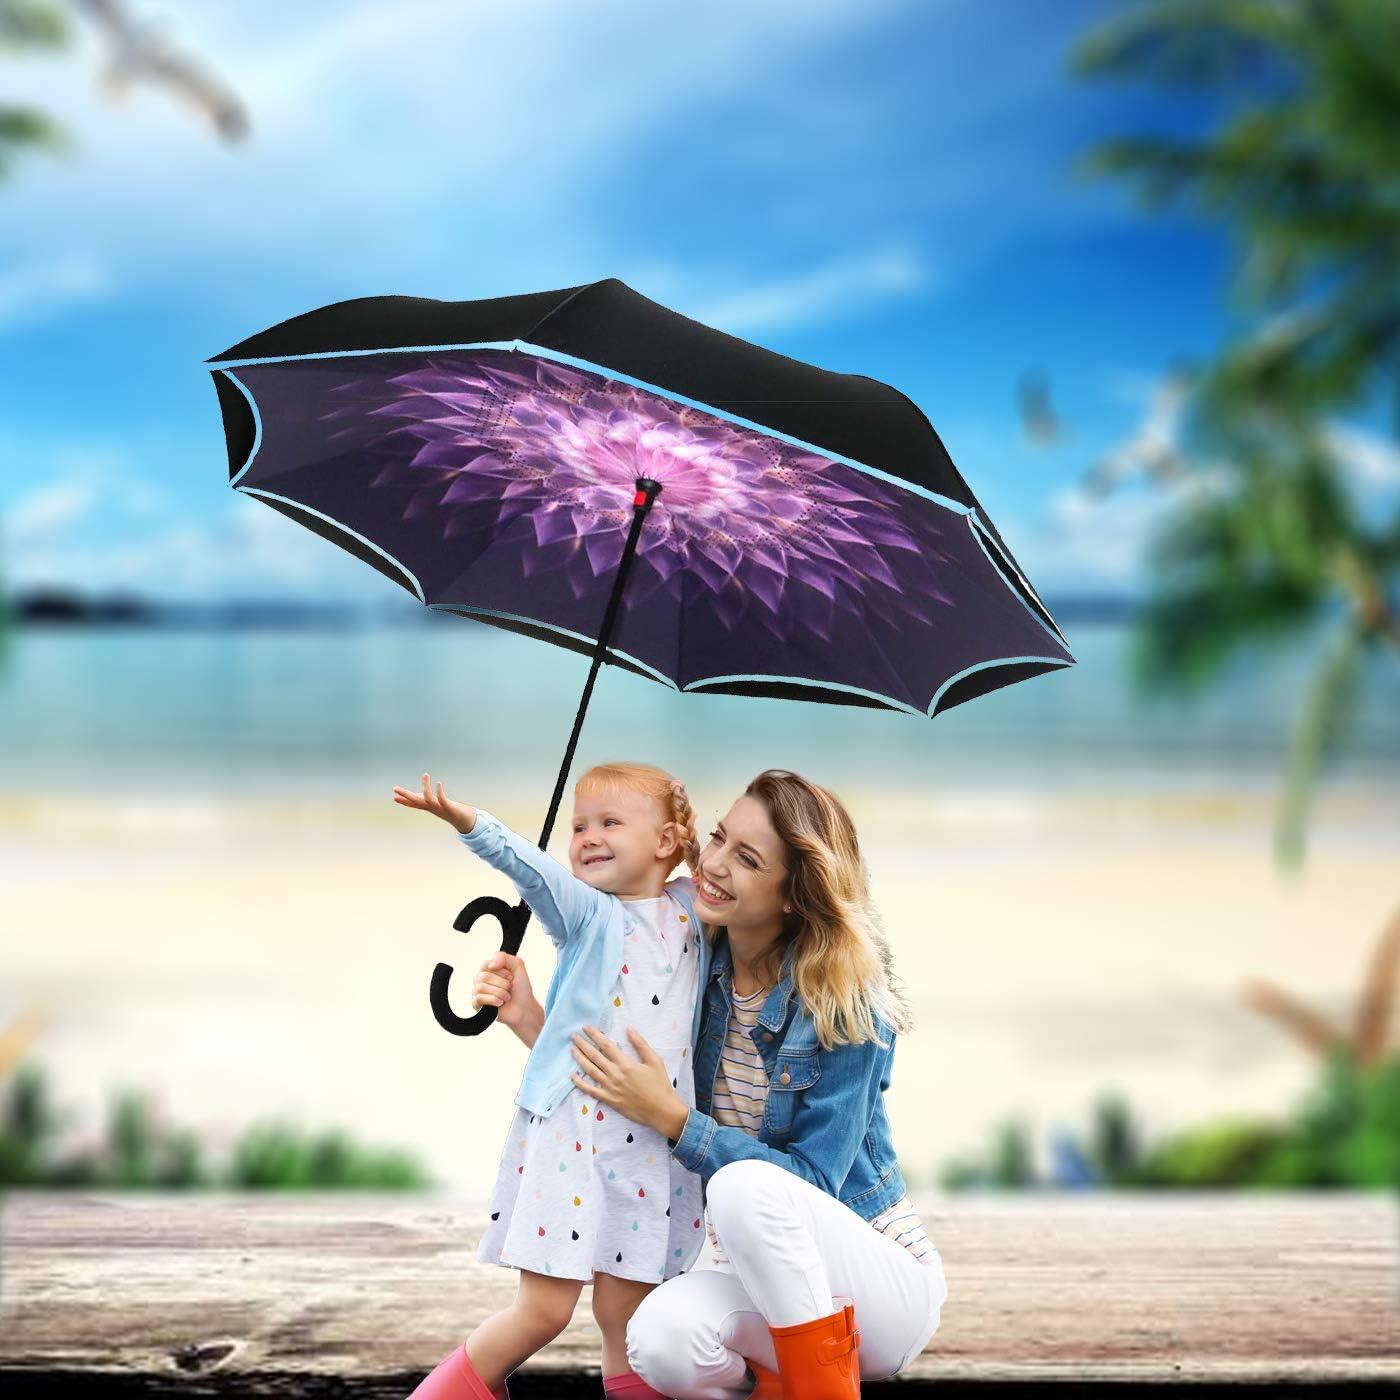 Reflective Reverse Umbrella,Inverted C-Handle Umbrella,Windproof Folding Upside Down Safety,Women with UV Protection Umbrella Blue flower